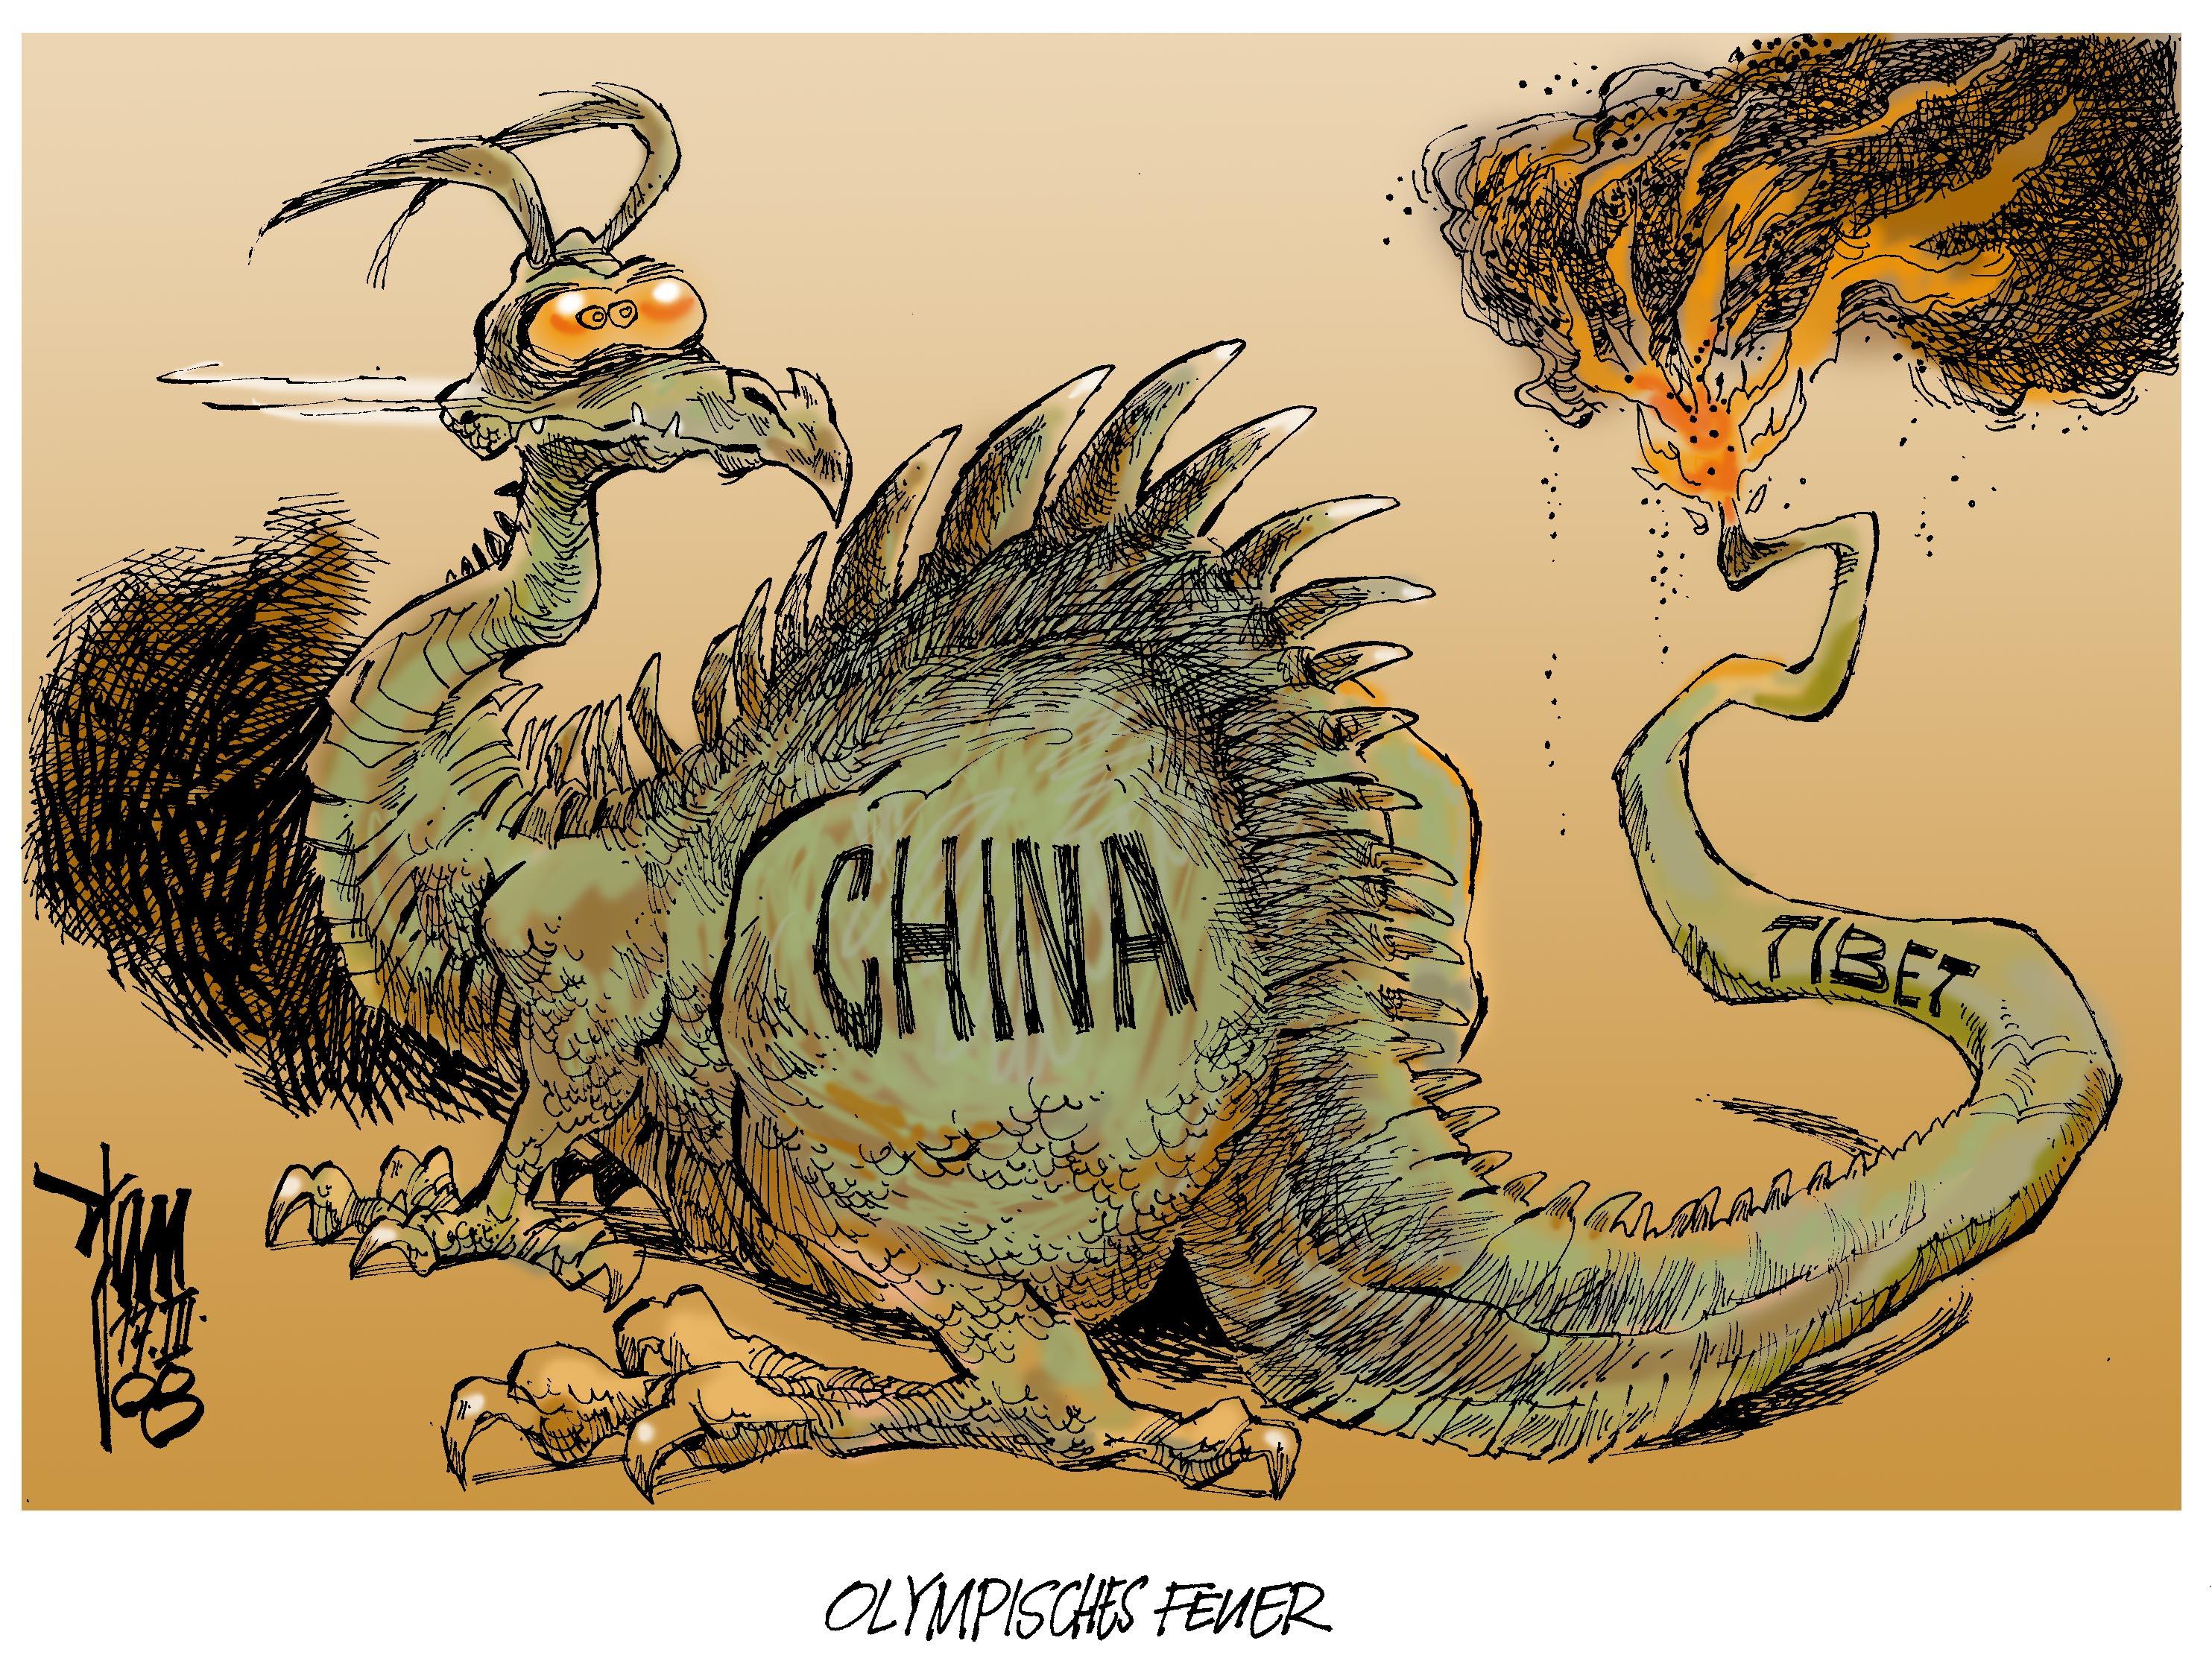 China Tibet Konflikt